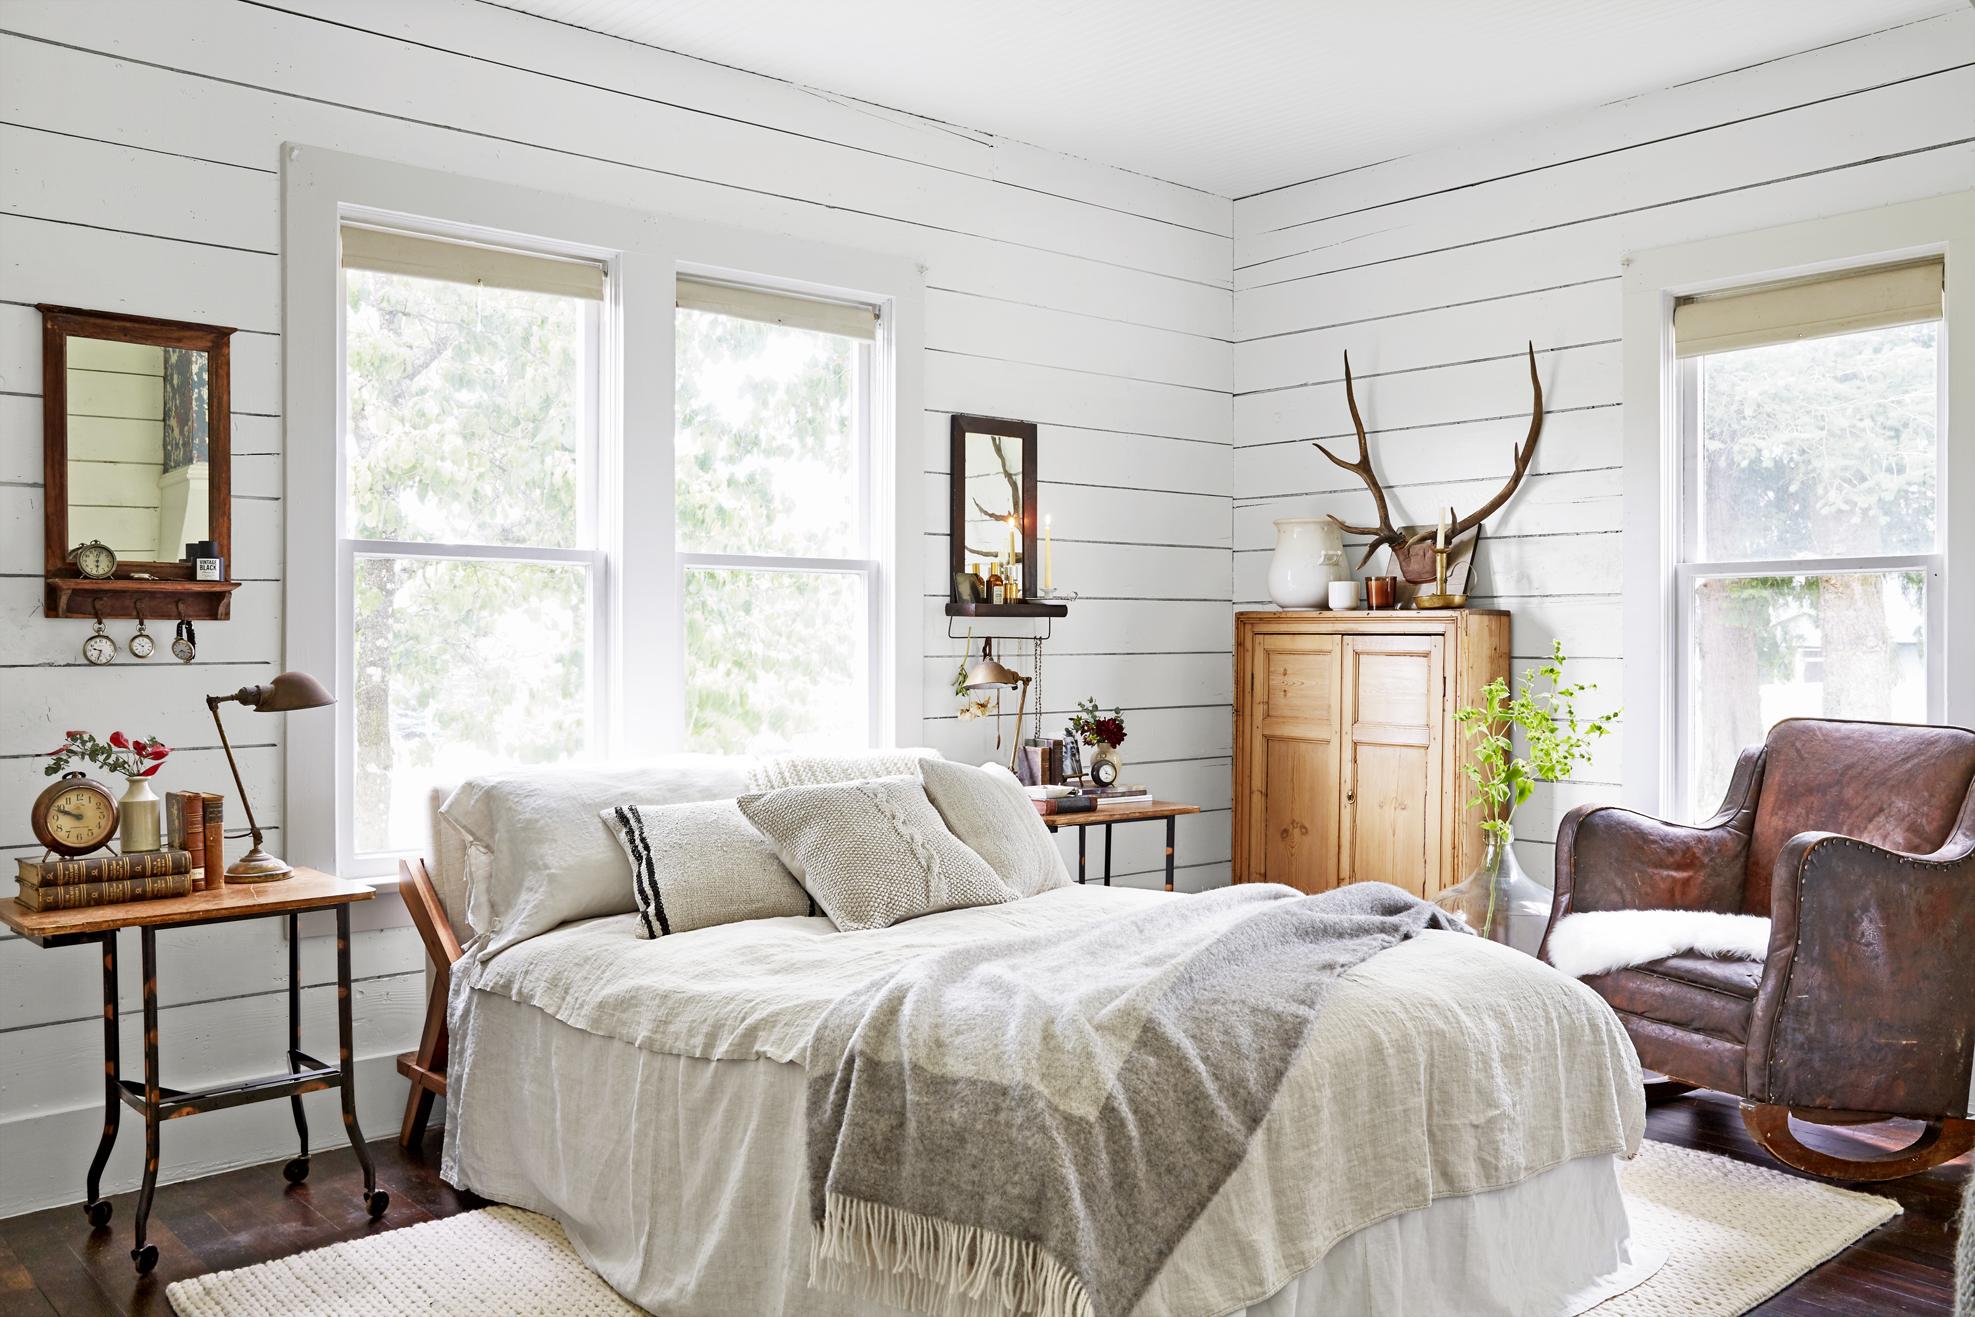 Lodge Bedroom Decor 101 Bedroom Decorating Ideas In 2017 Designs For Beautiful Bedrooms